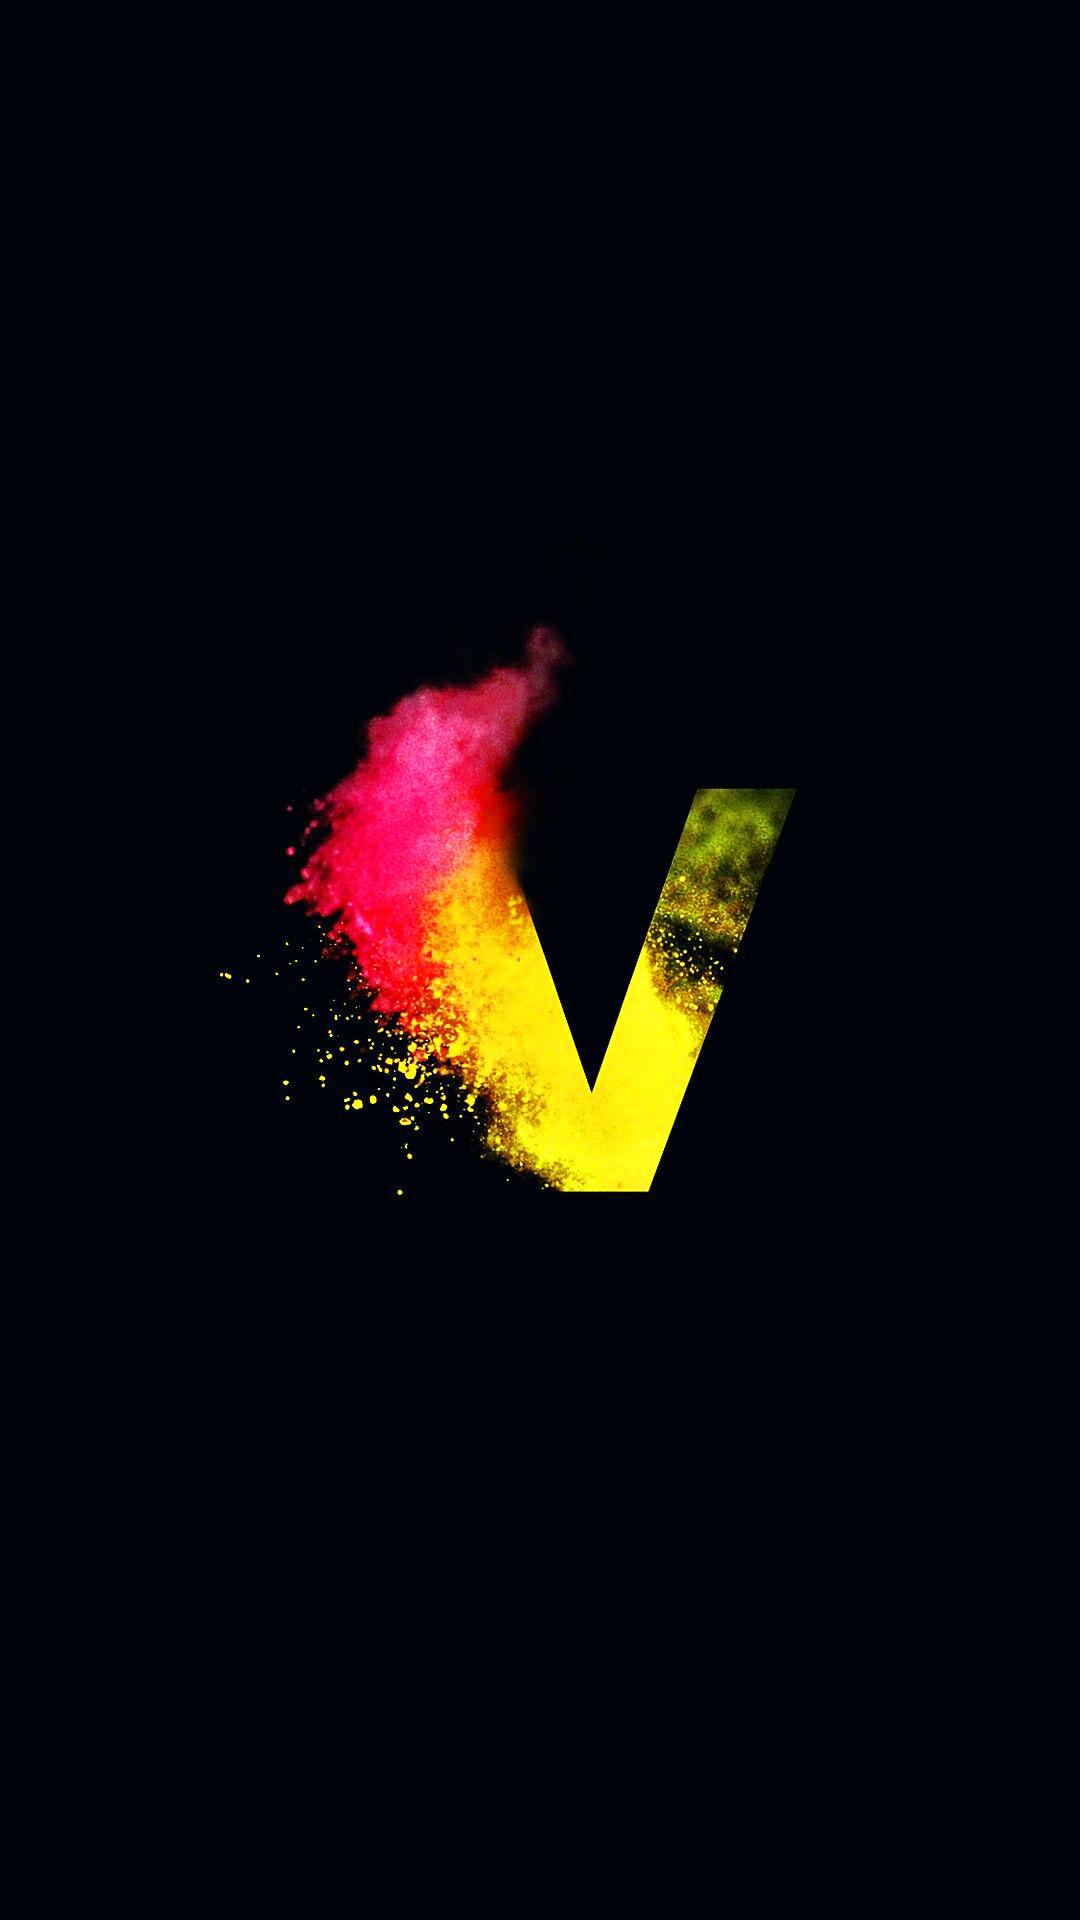 New V Name Dp Images